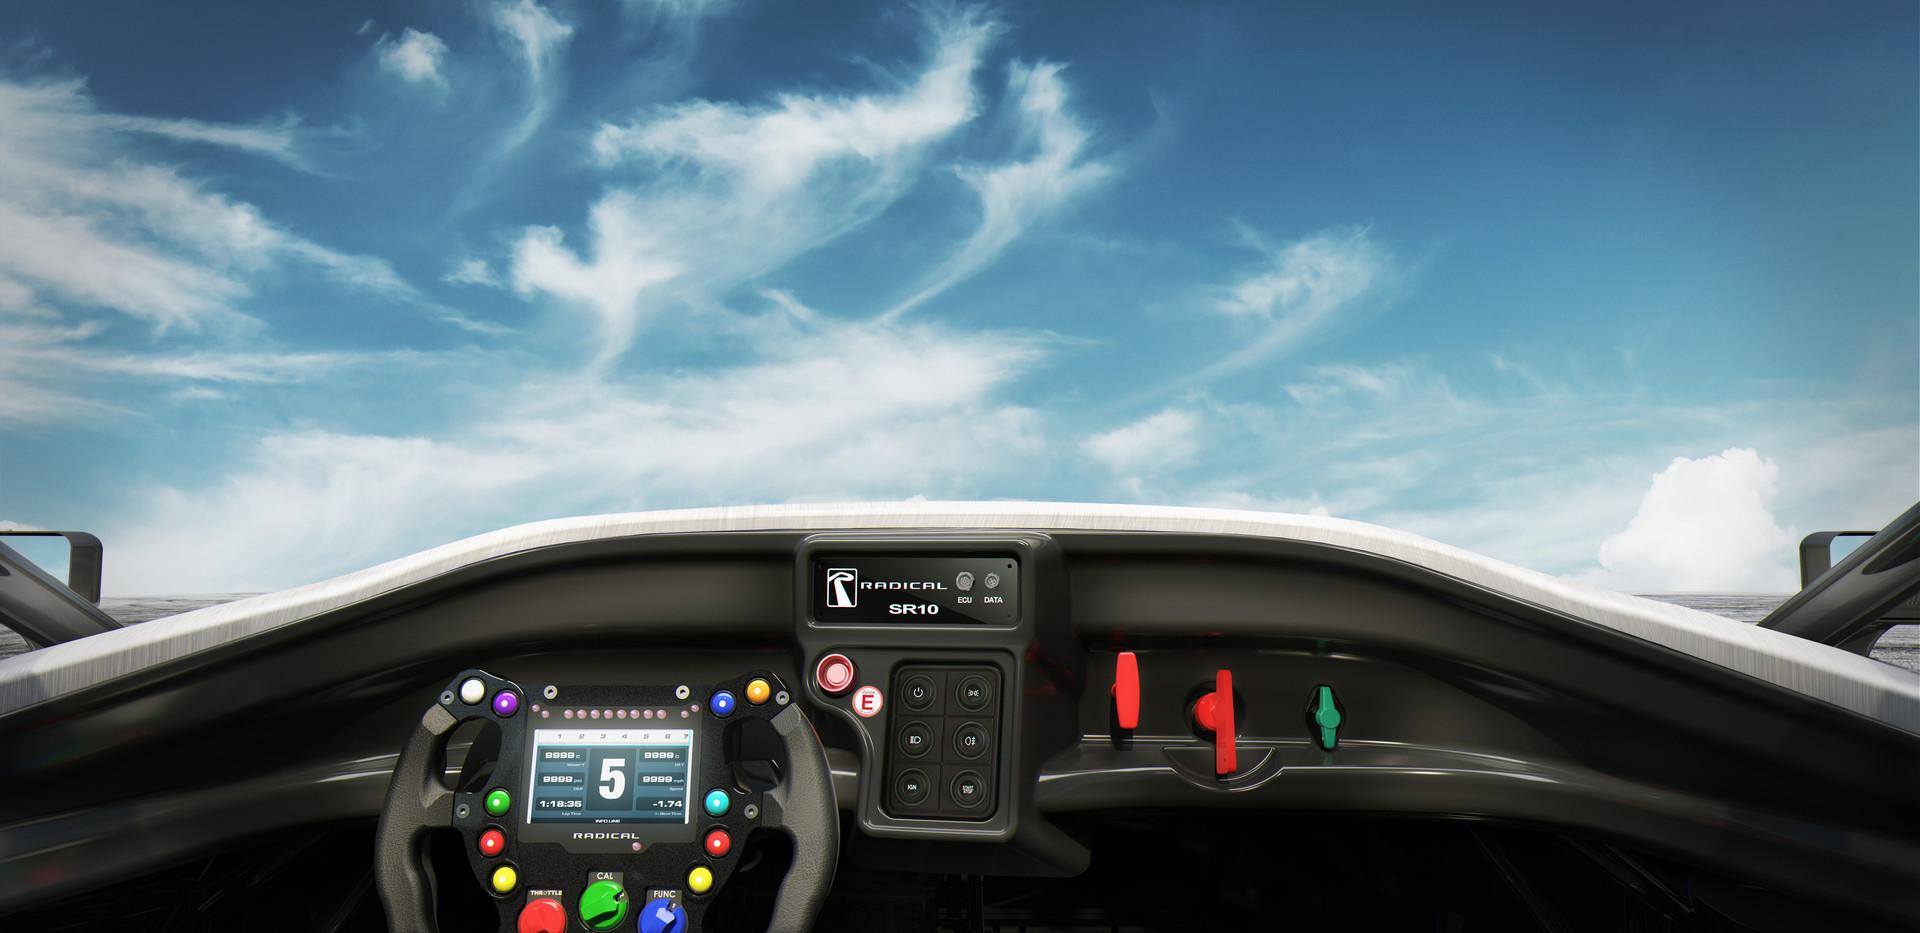 radical_SR10_interior_view.jpg